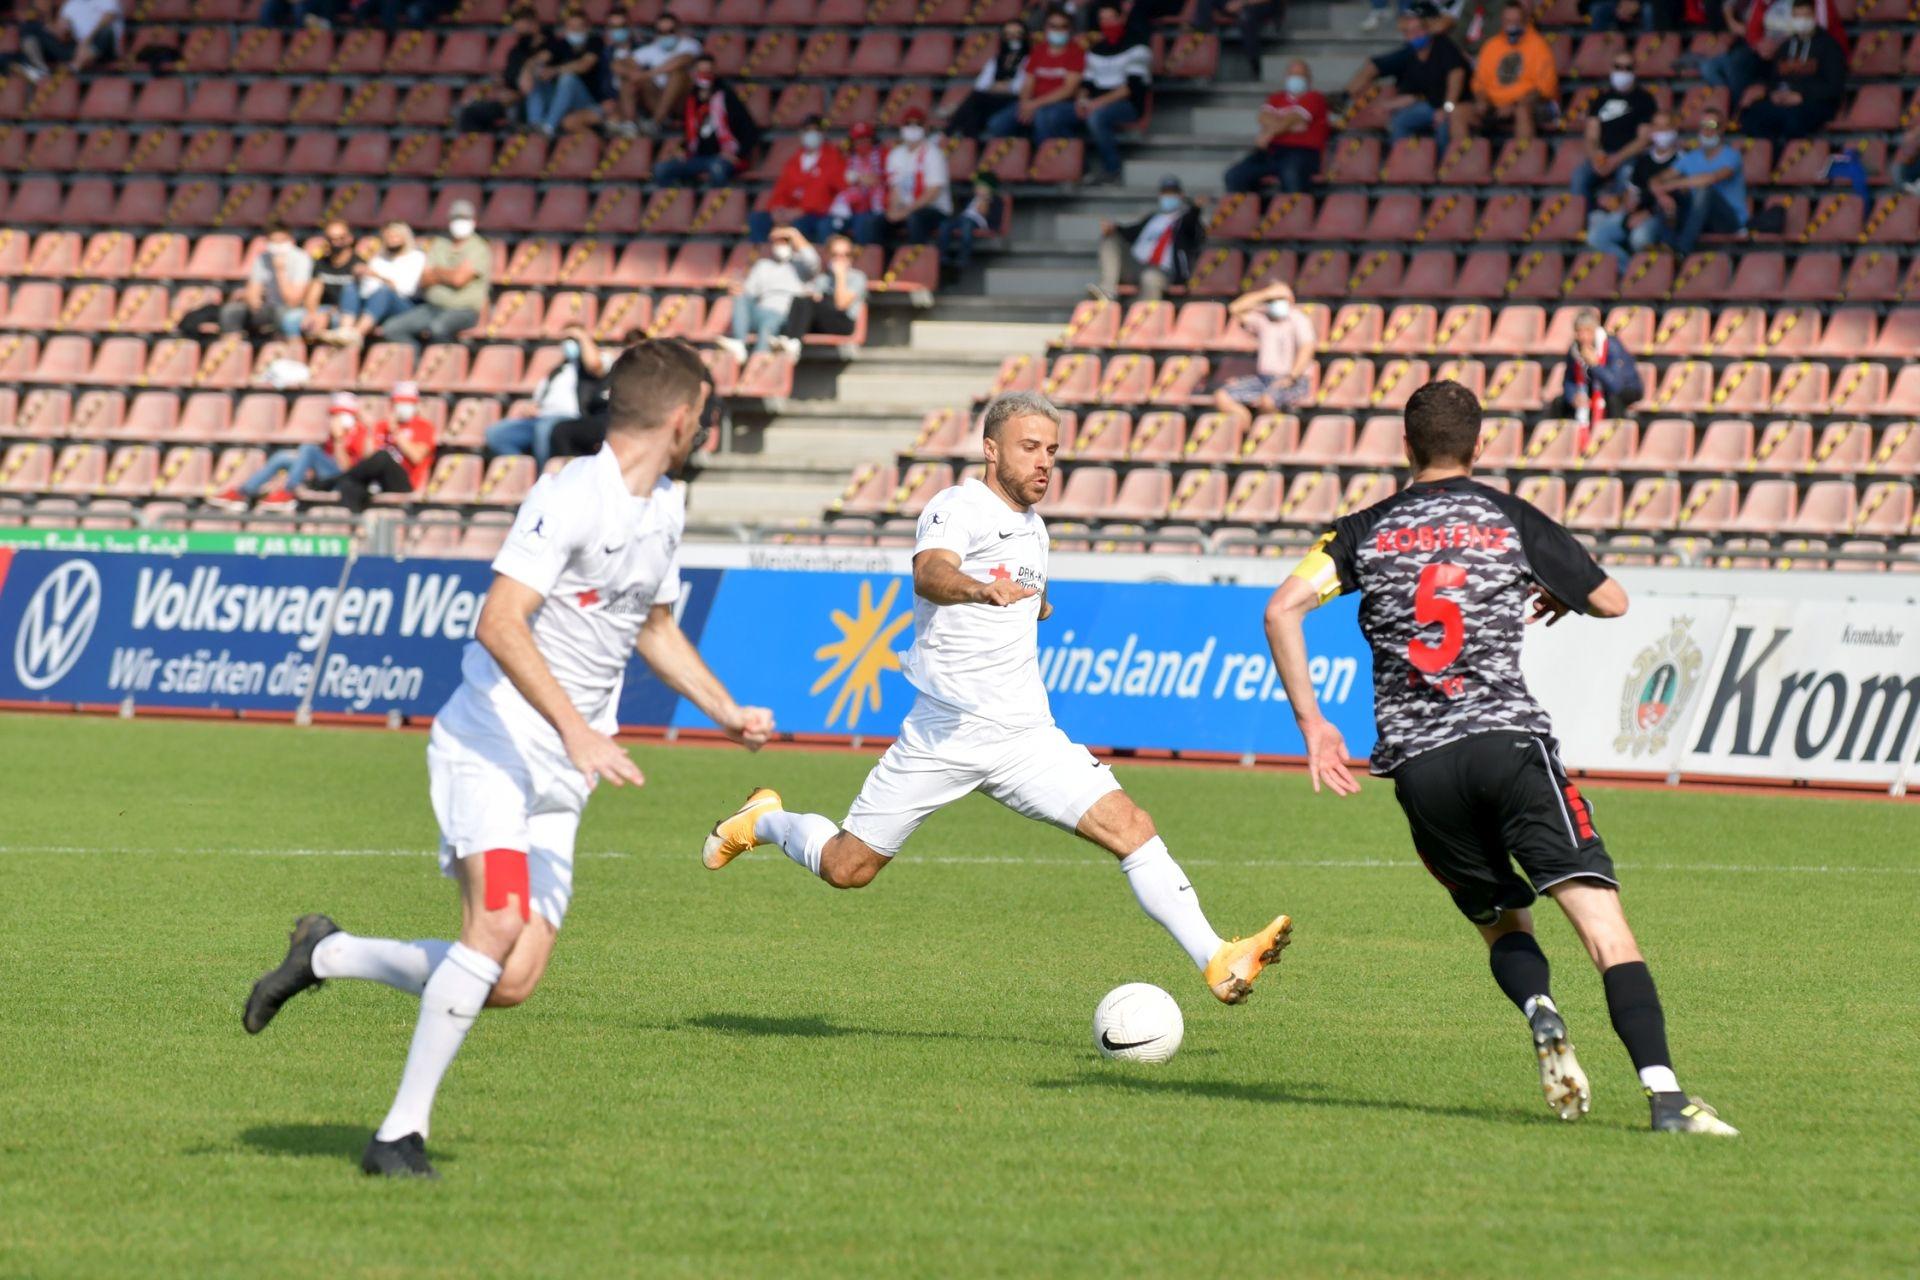 Regionalliga Südwest 2020/21, KSV Hessen Kassel, Rot-Weiss-Koblenz, Endstand 1:1, Alban Meha